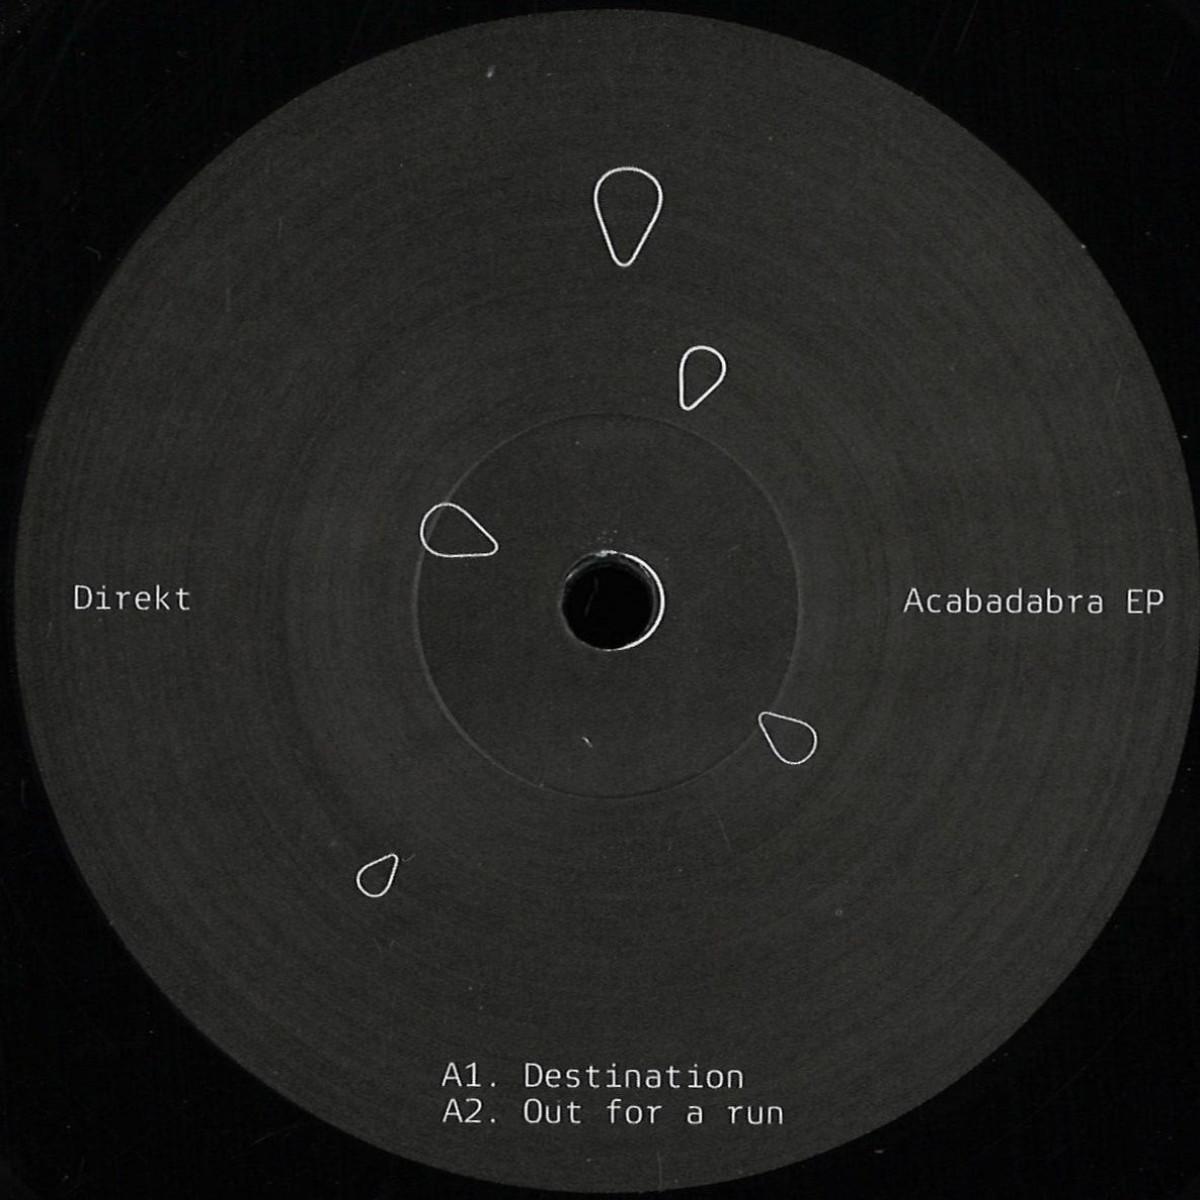 Direkt - Acabadabra EP [UVAR] 01